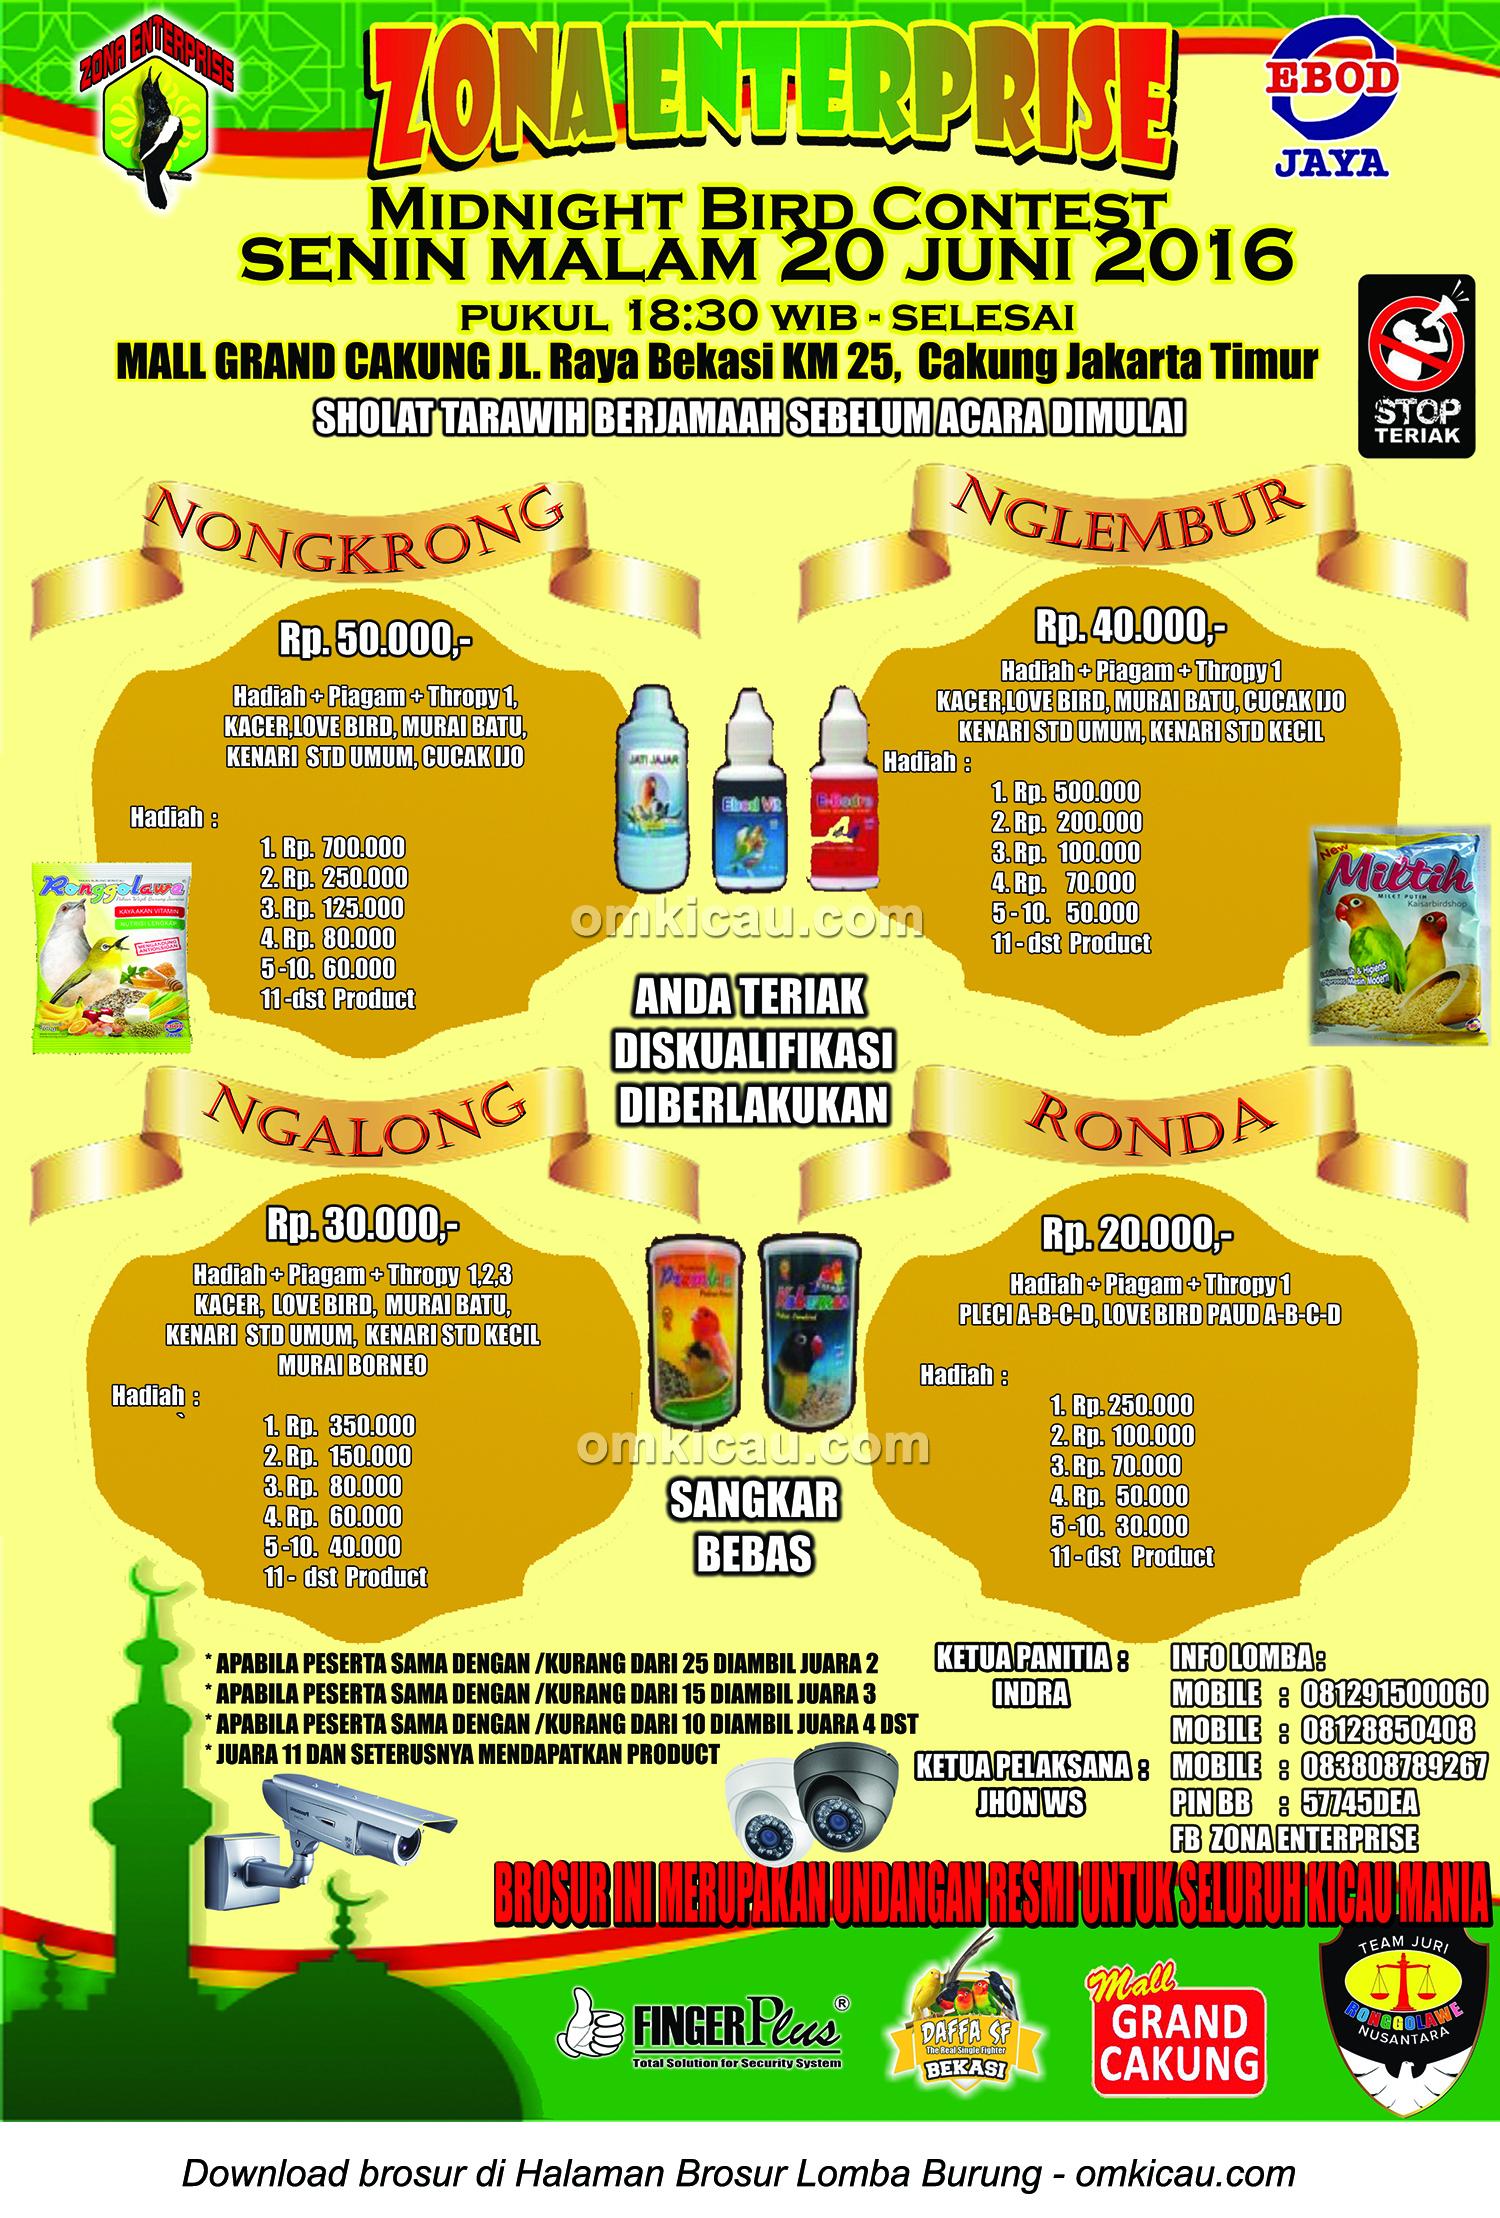 Brosur Zona Enterprise Midnight Bird Contest, Jakarta Timur, 20 Juni 2016